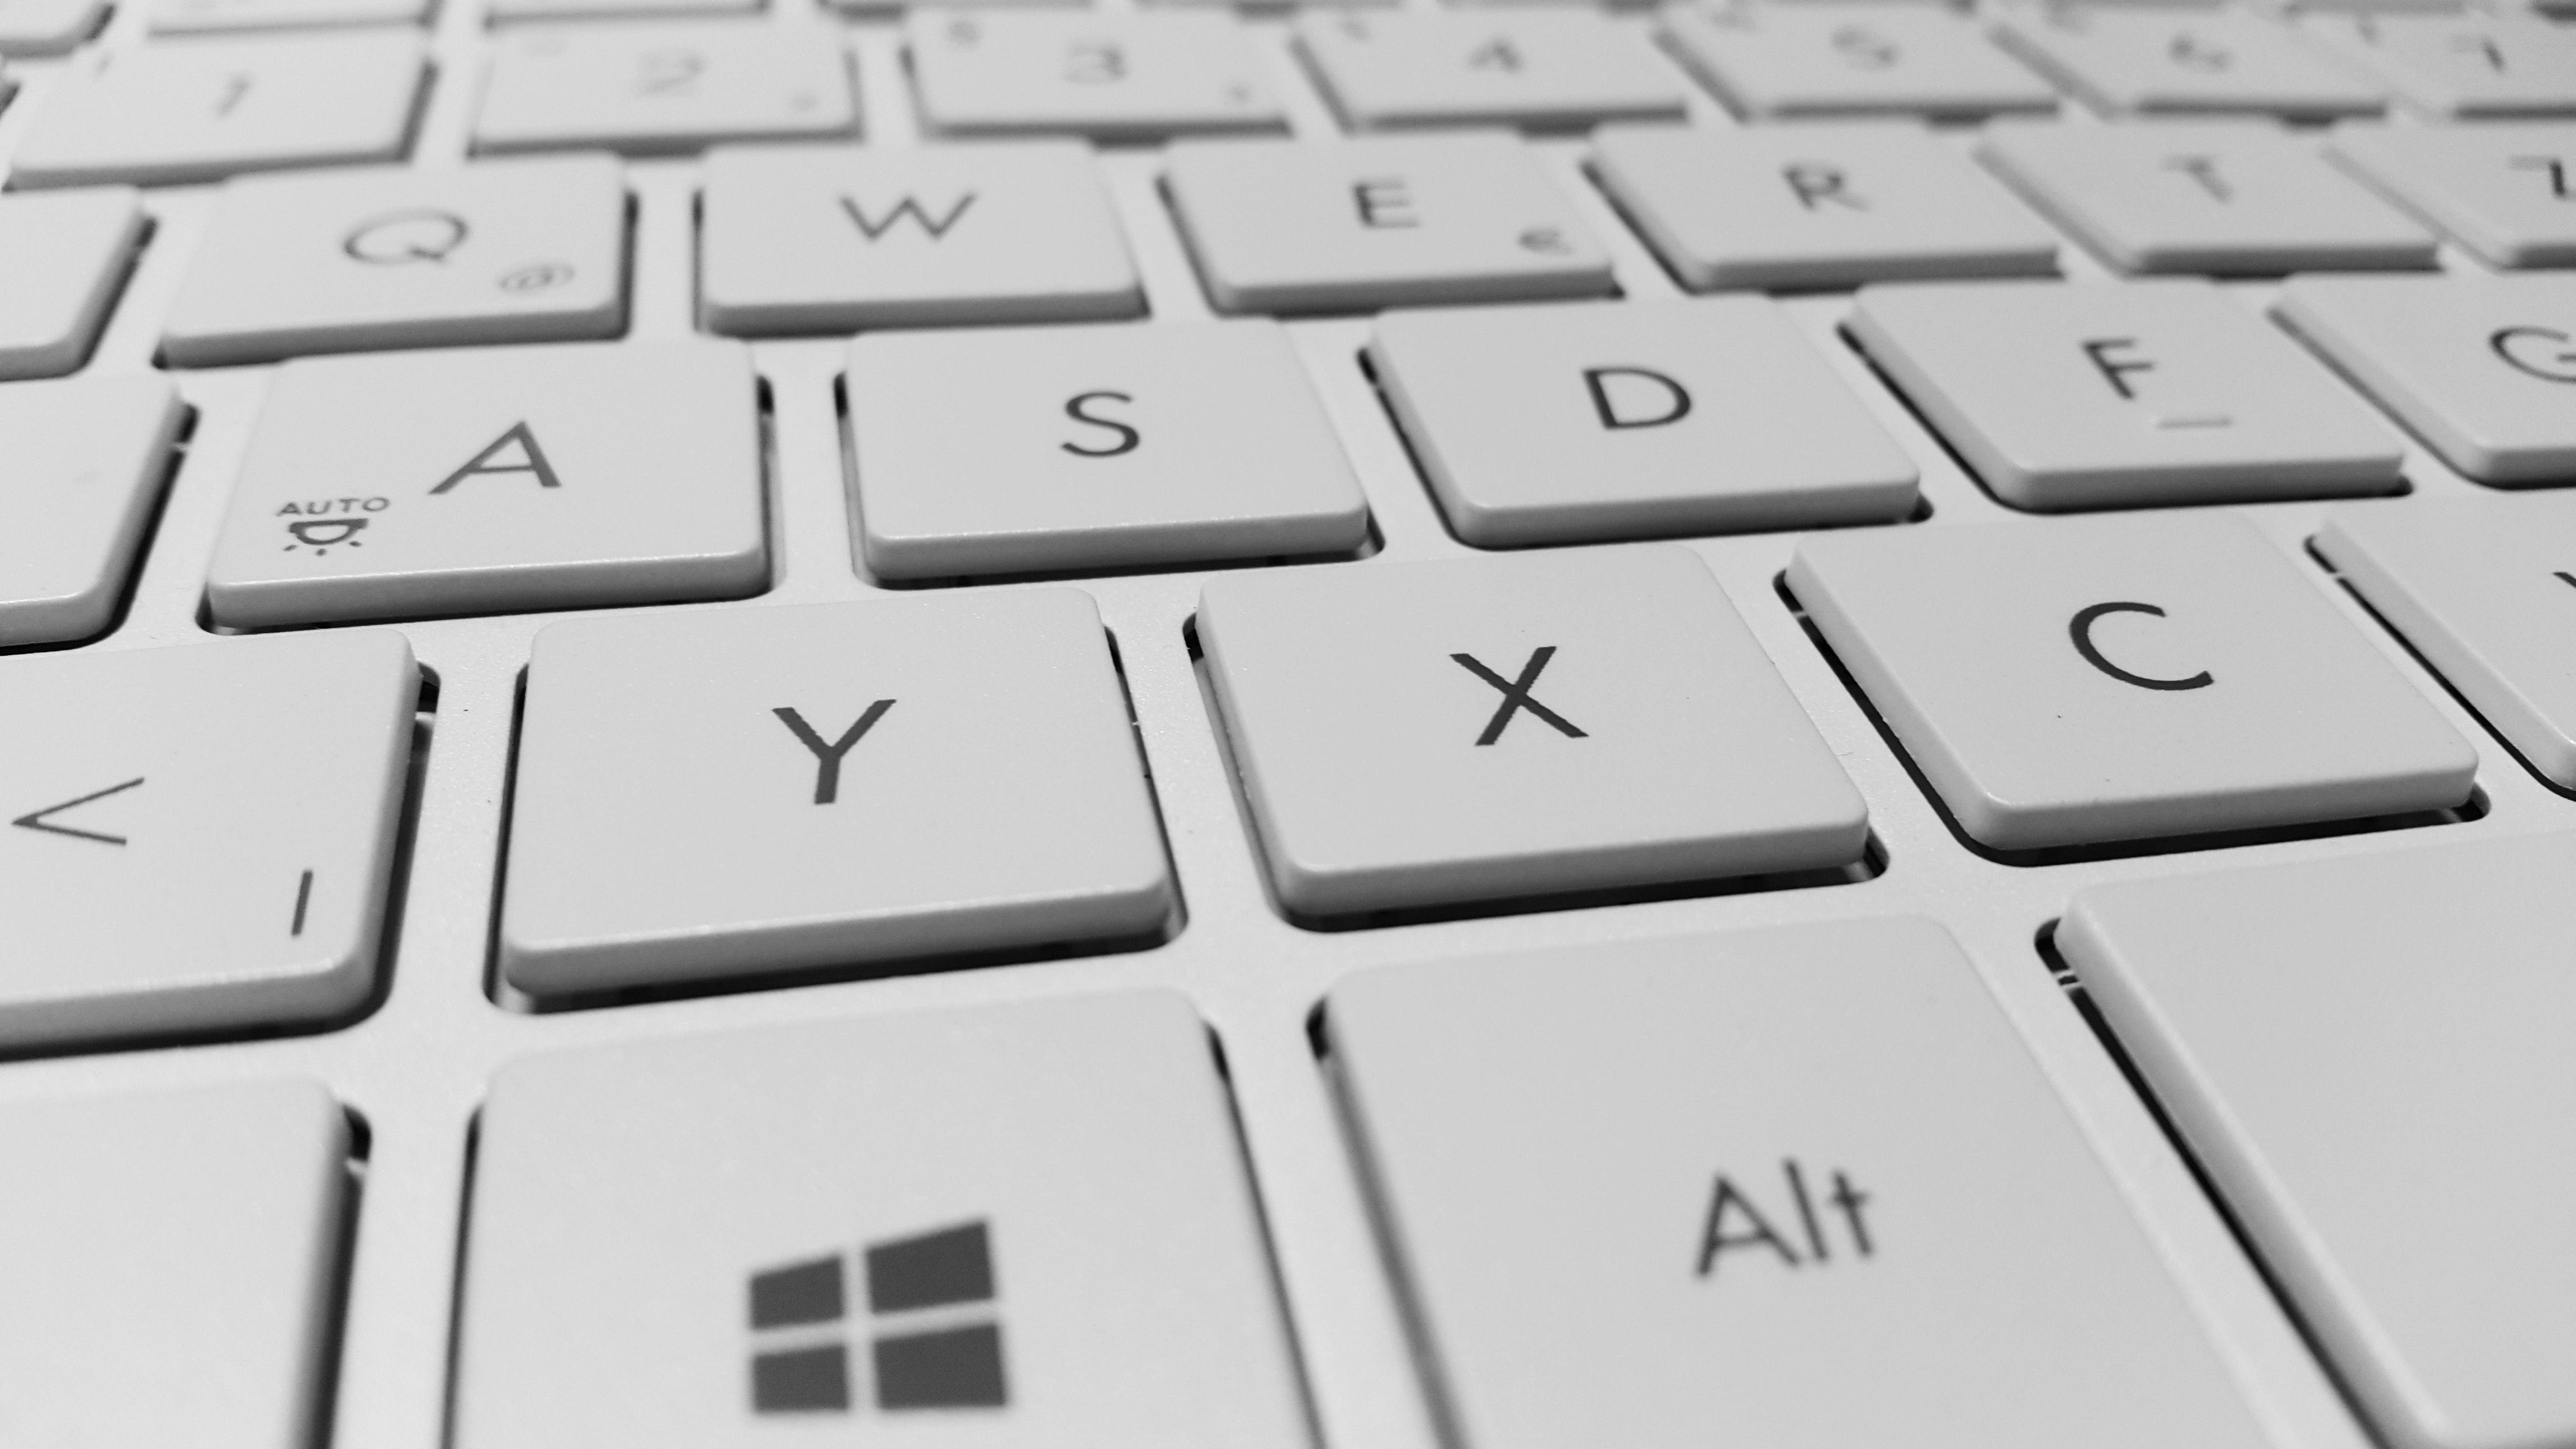 Close up photo of a laptop keyboard